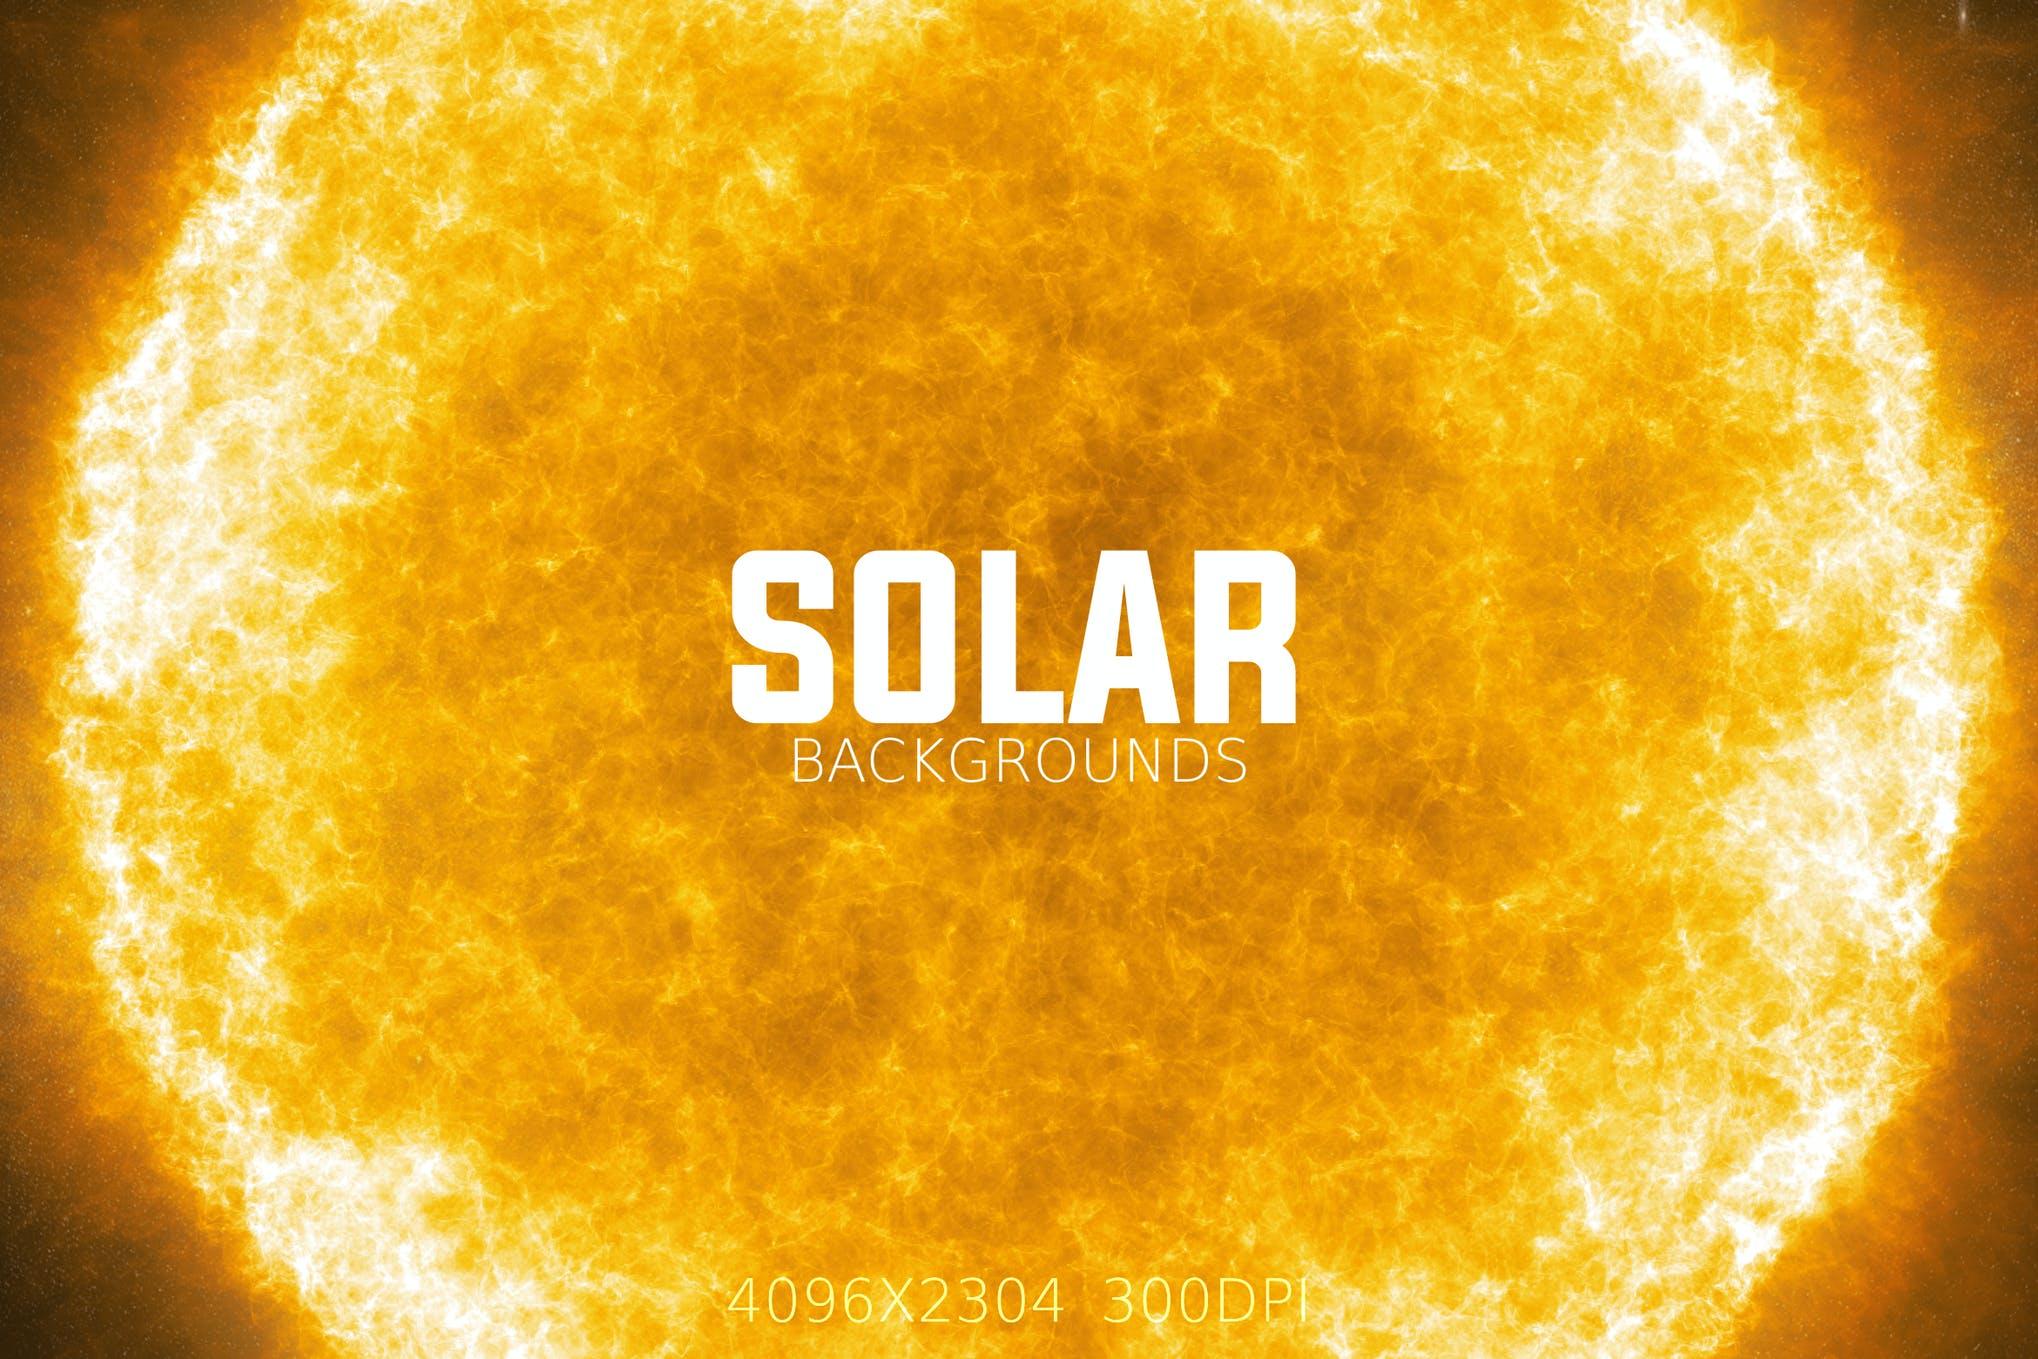 Solar Backgrounds